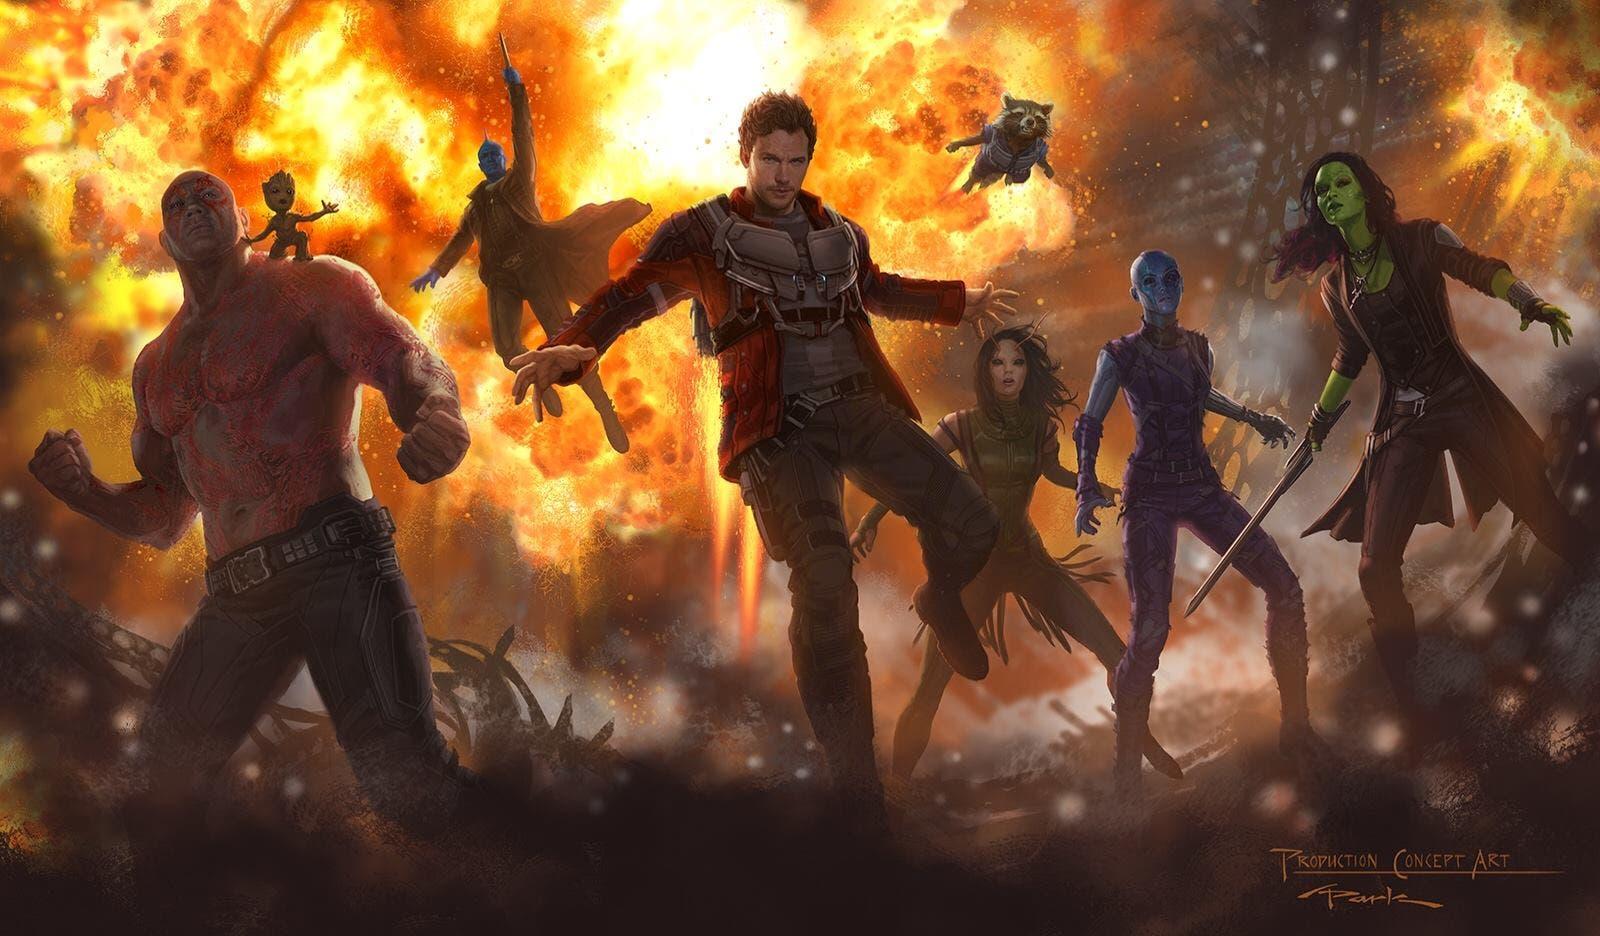 Areajugones Guardians of the Galaxy vol 2 concept art